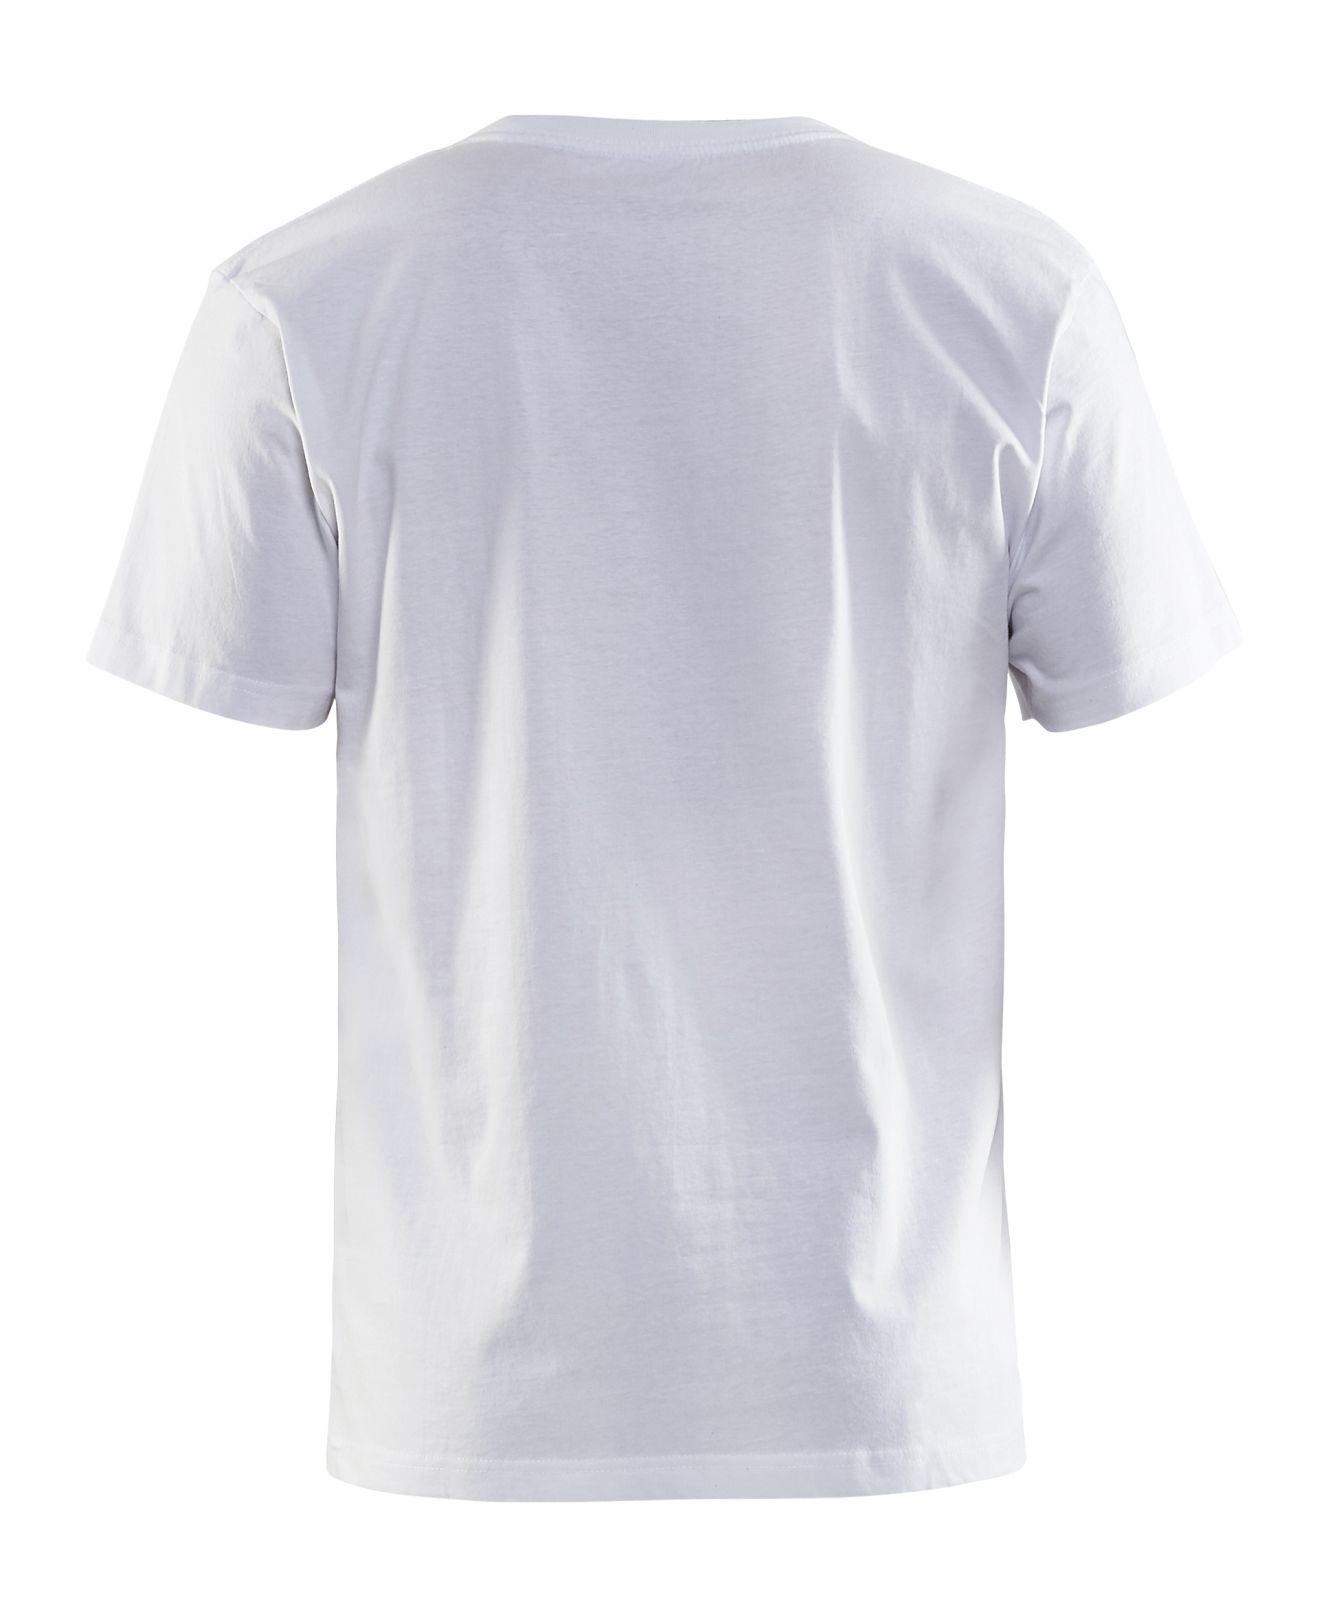 Blaklader T-shirts 35351063 wit(1000)